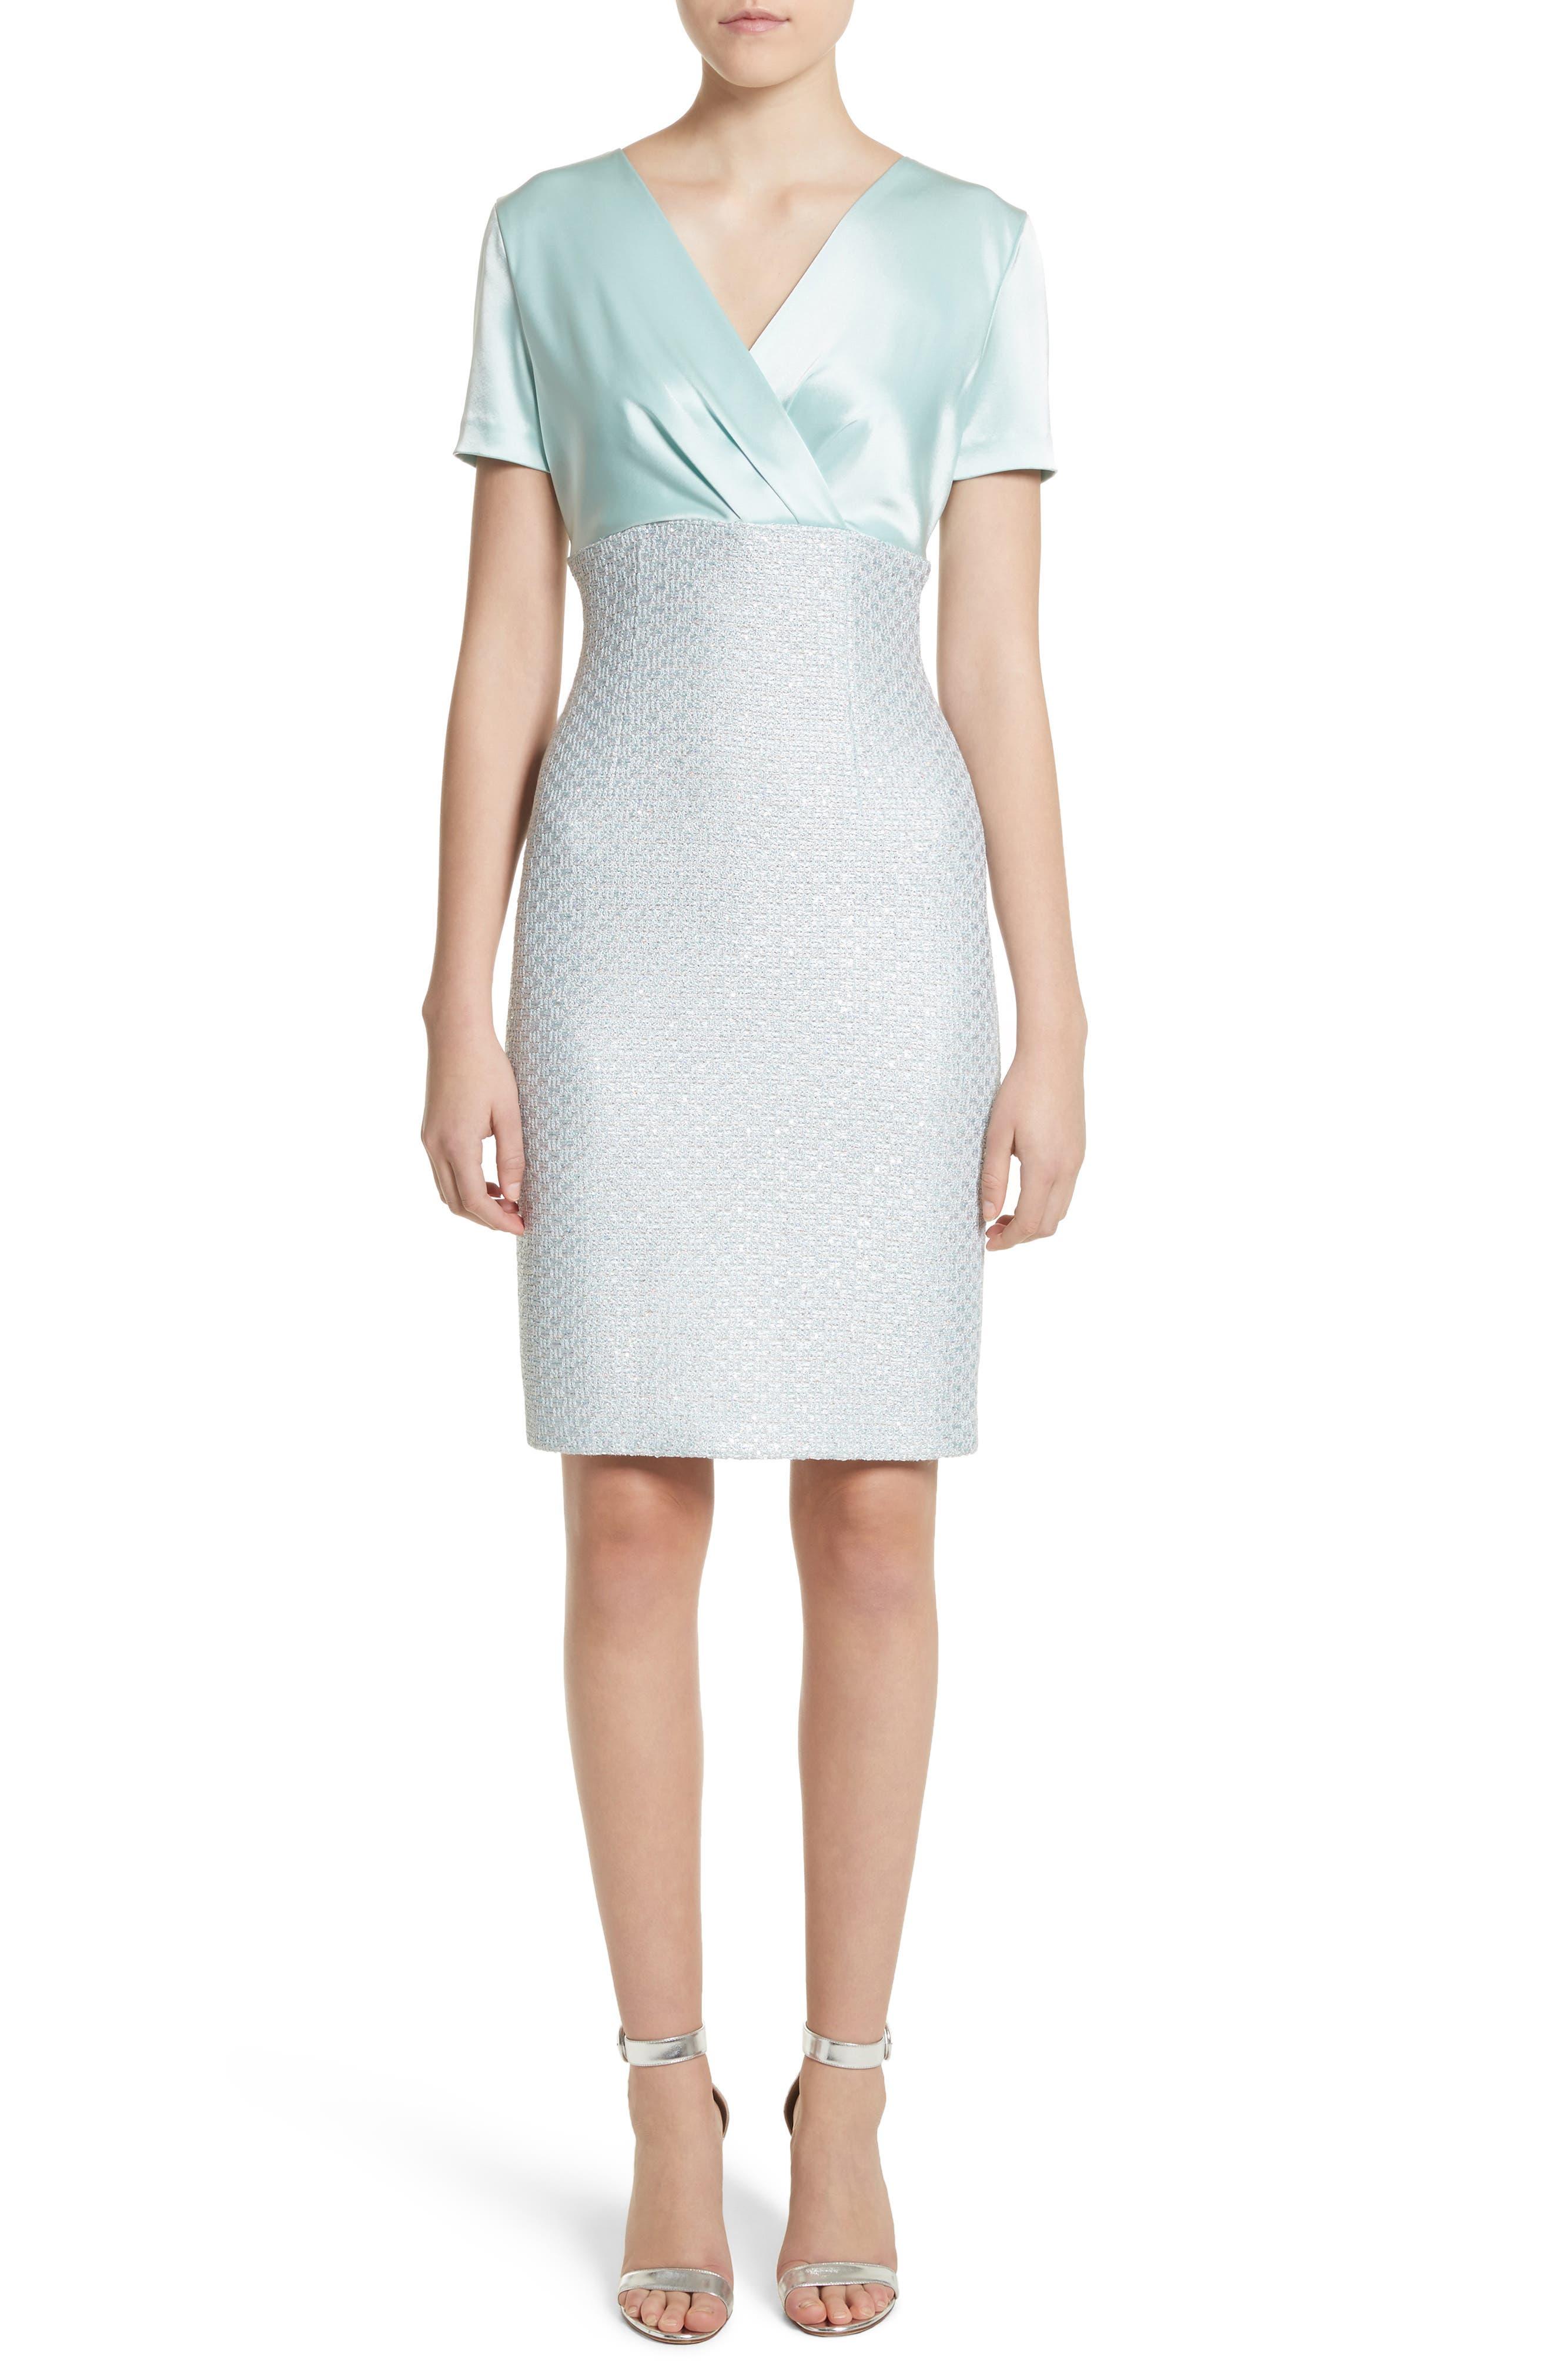 Hansh Satin & Knit Sheath Dress,                         Main,                         color, 440